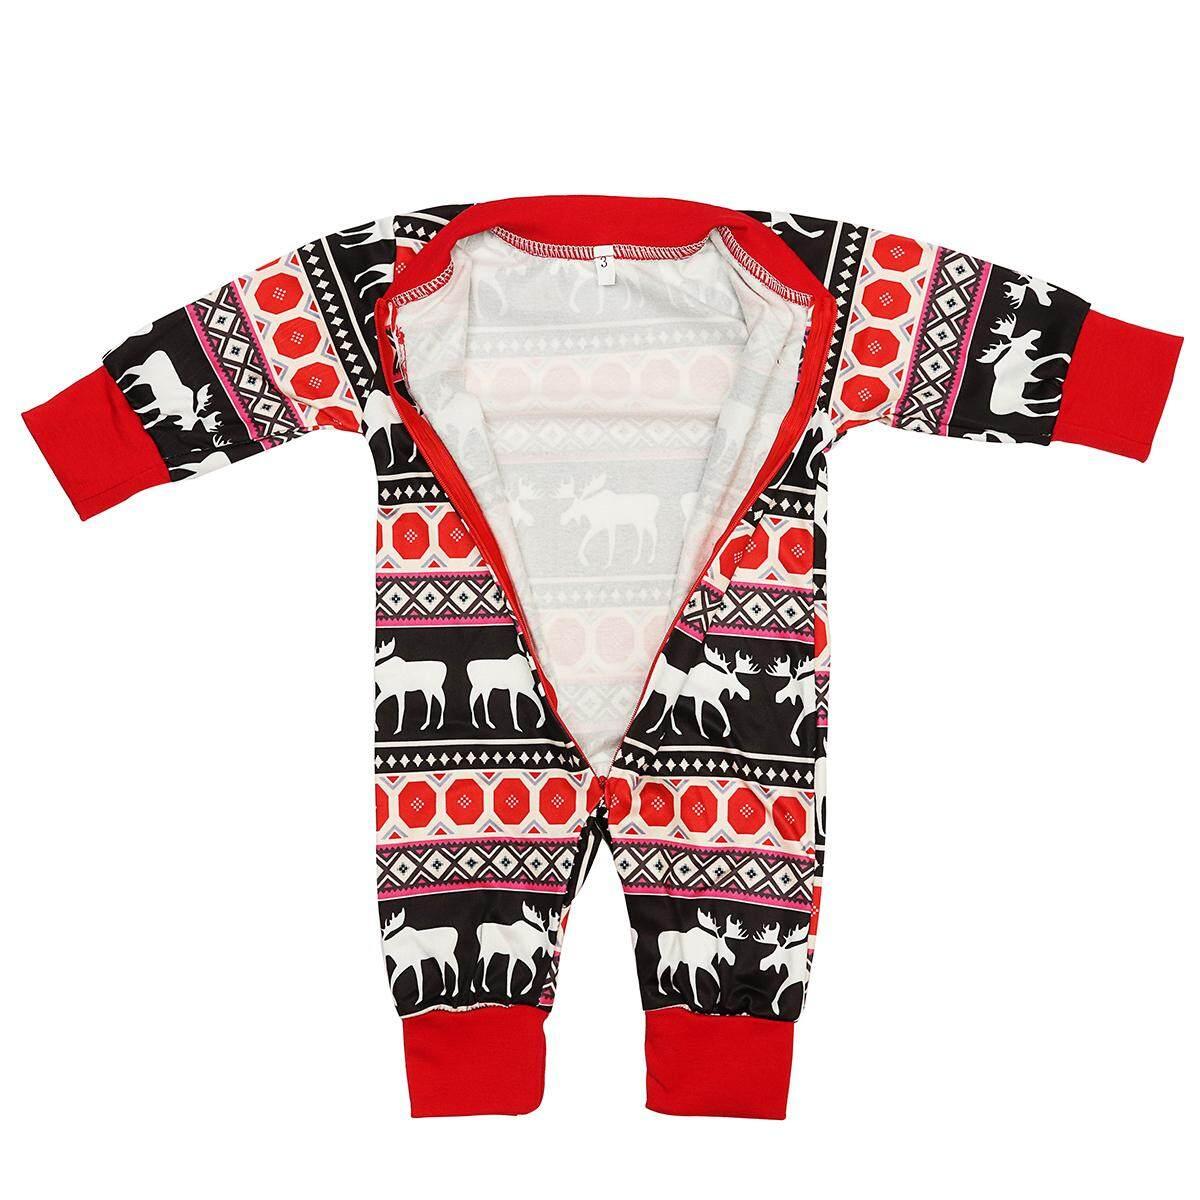 b6d87b3ac3 Women Men Kids Family Pajamas Set Home Sleepwear Nightwear Loungewear Moose  Fairy Warm Christmas Xmas